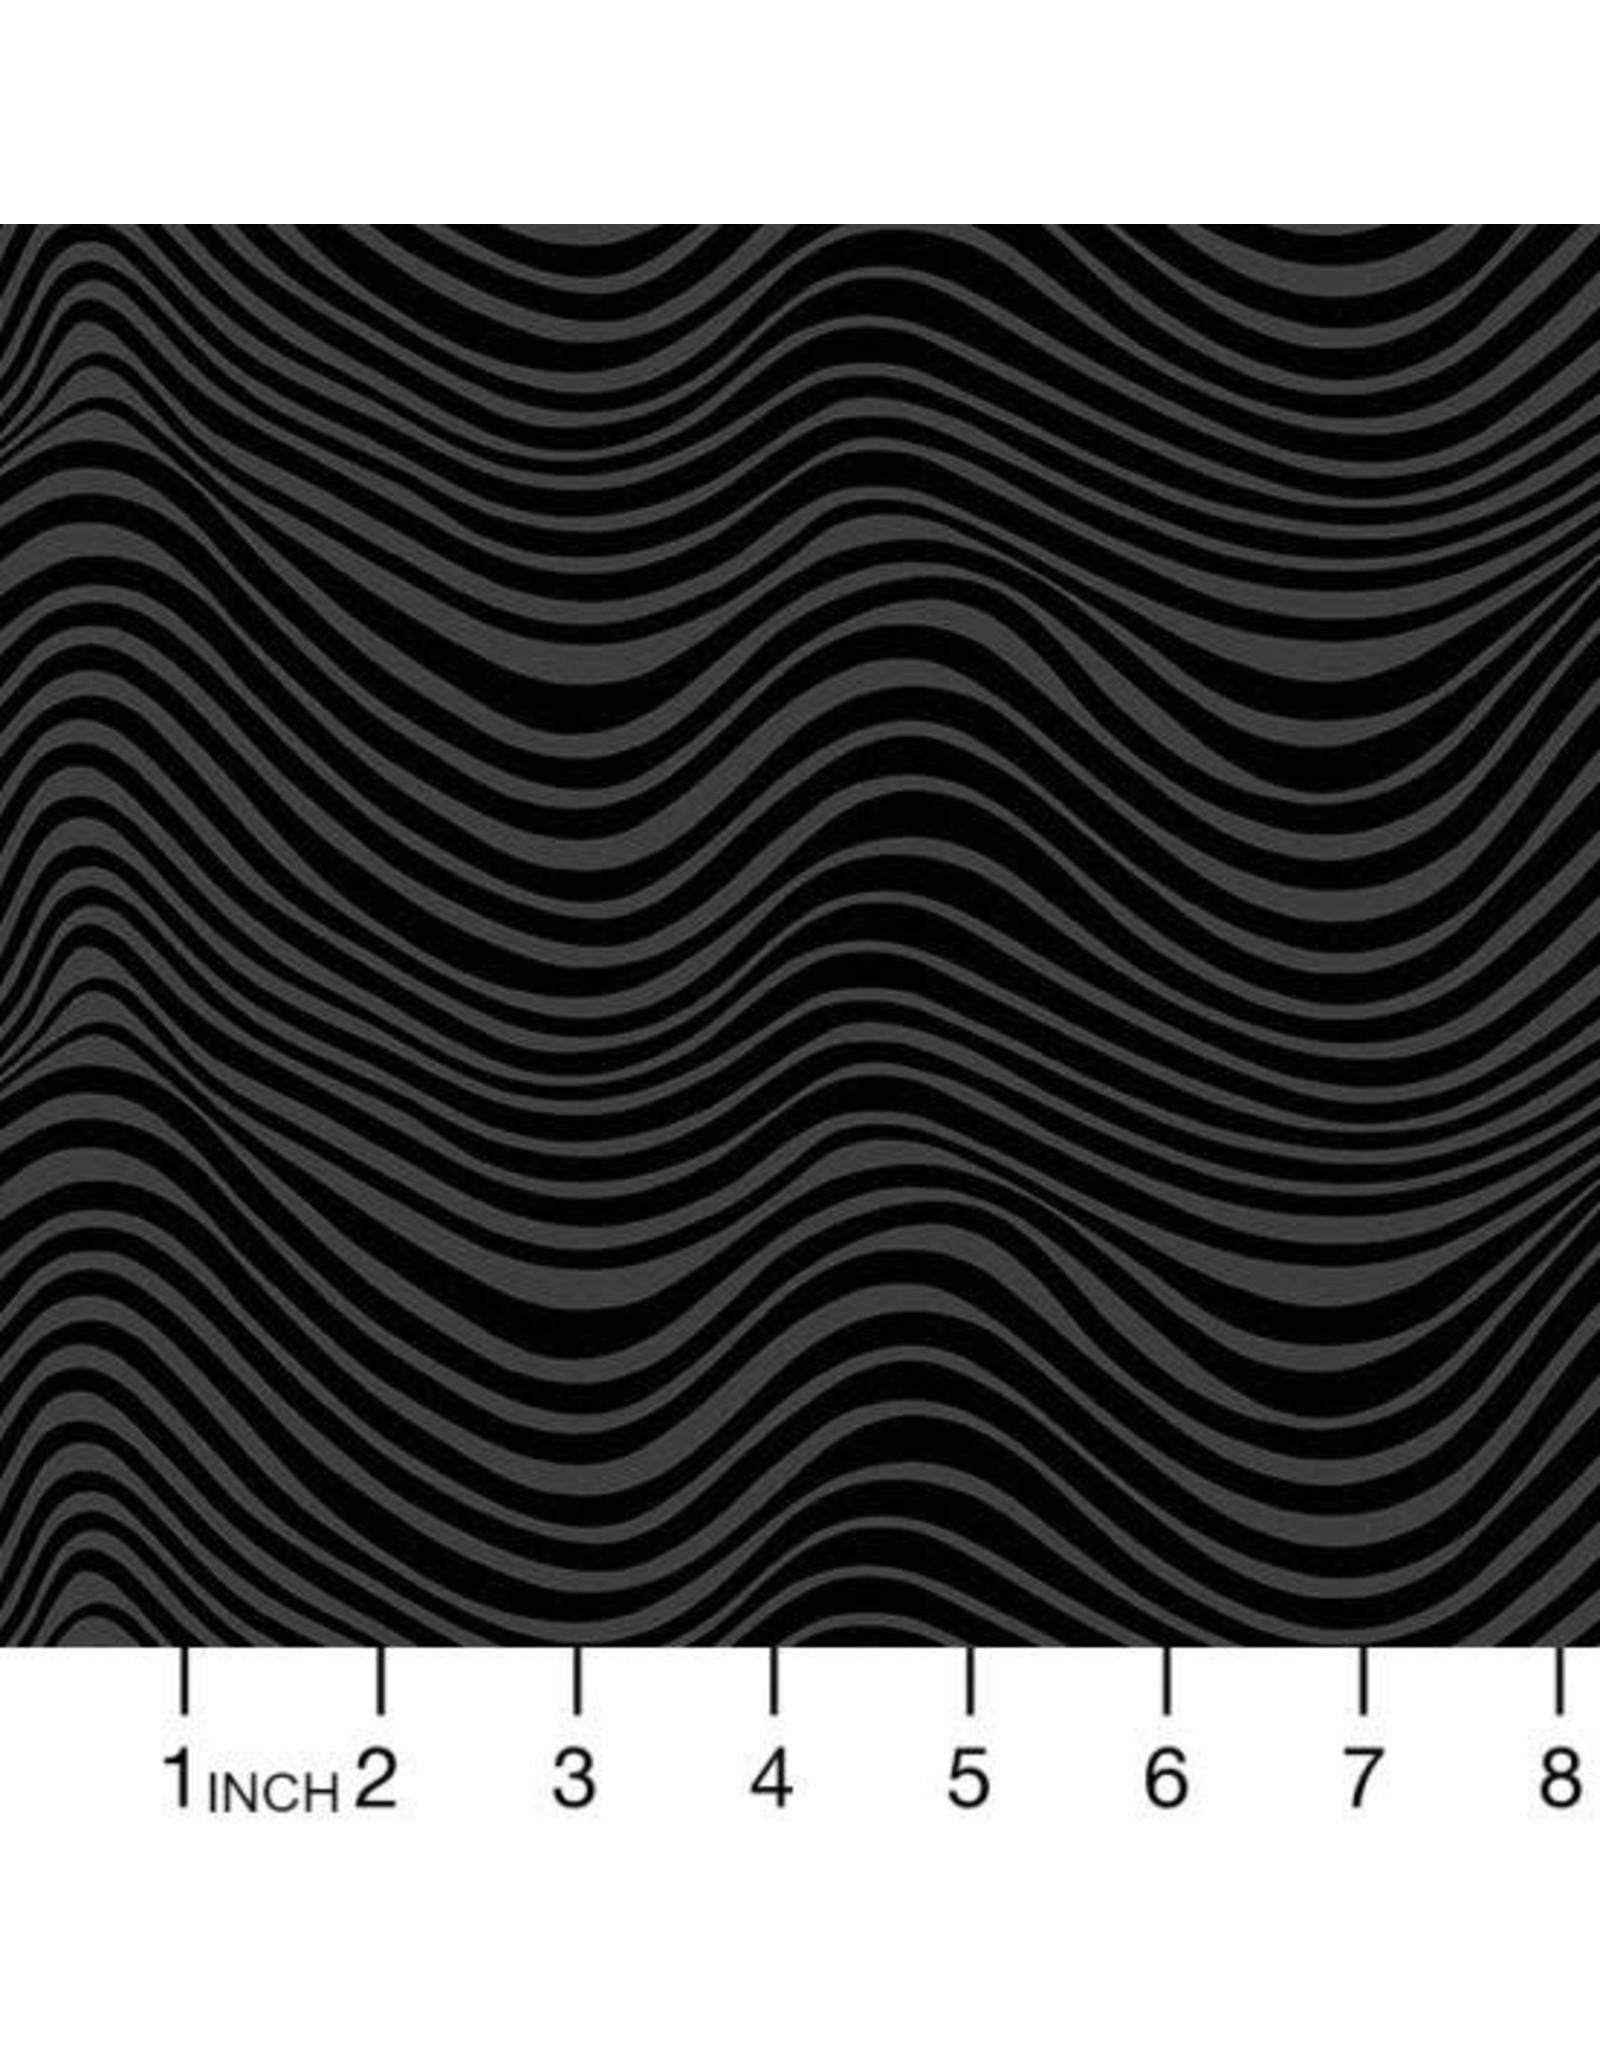 Libs Elliott Stealth, Waves in Coal, Fabric Half-Yards A-9662-K